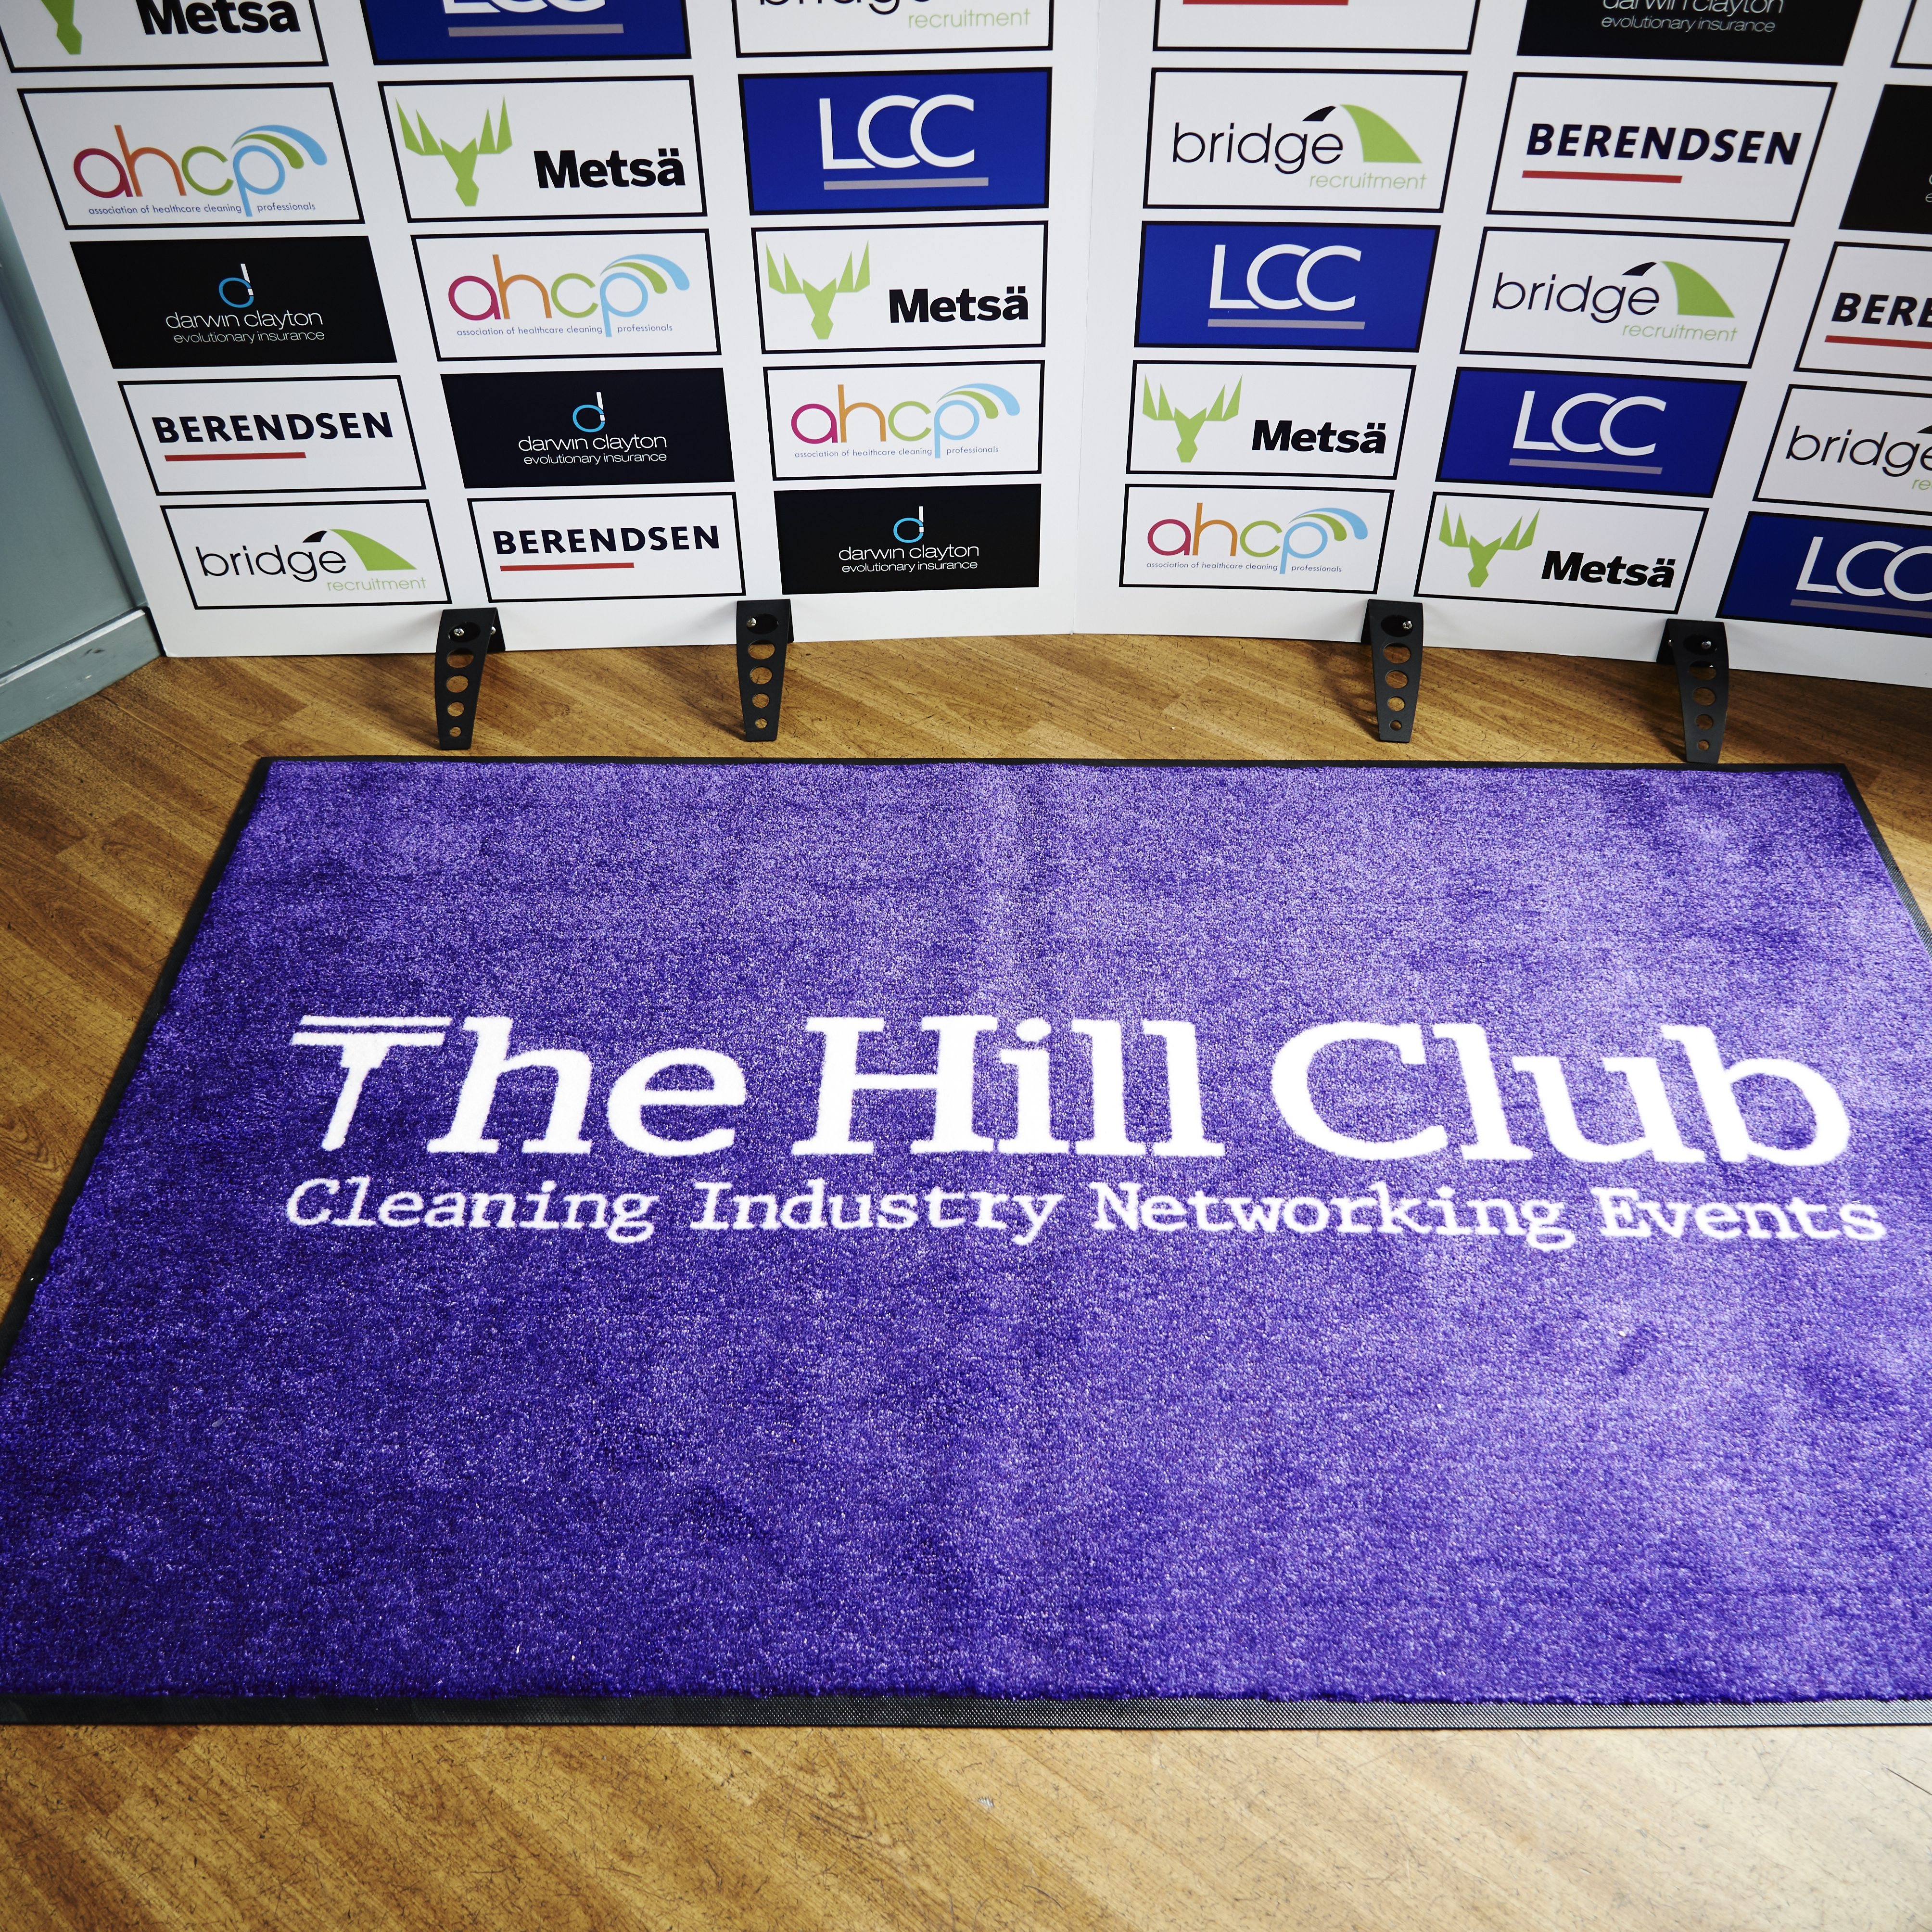 Hill Club Thames event